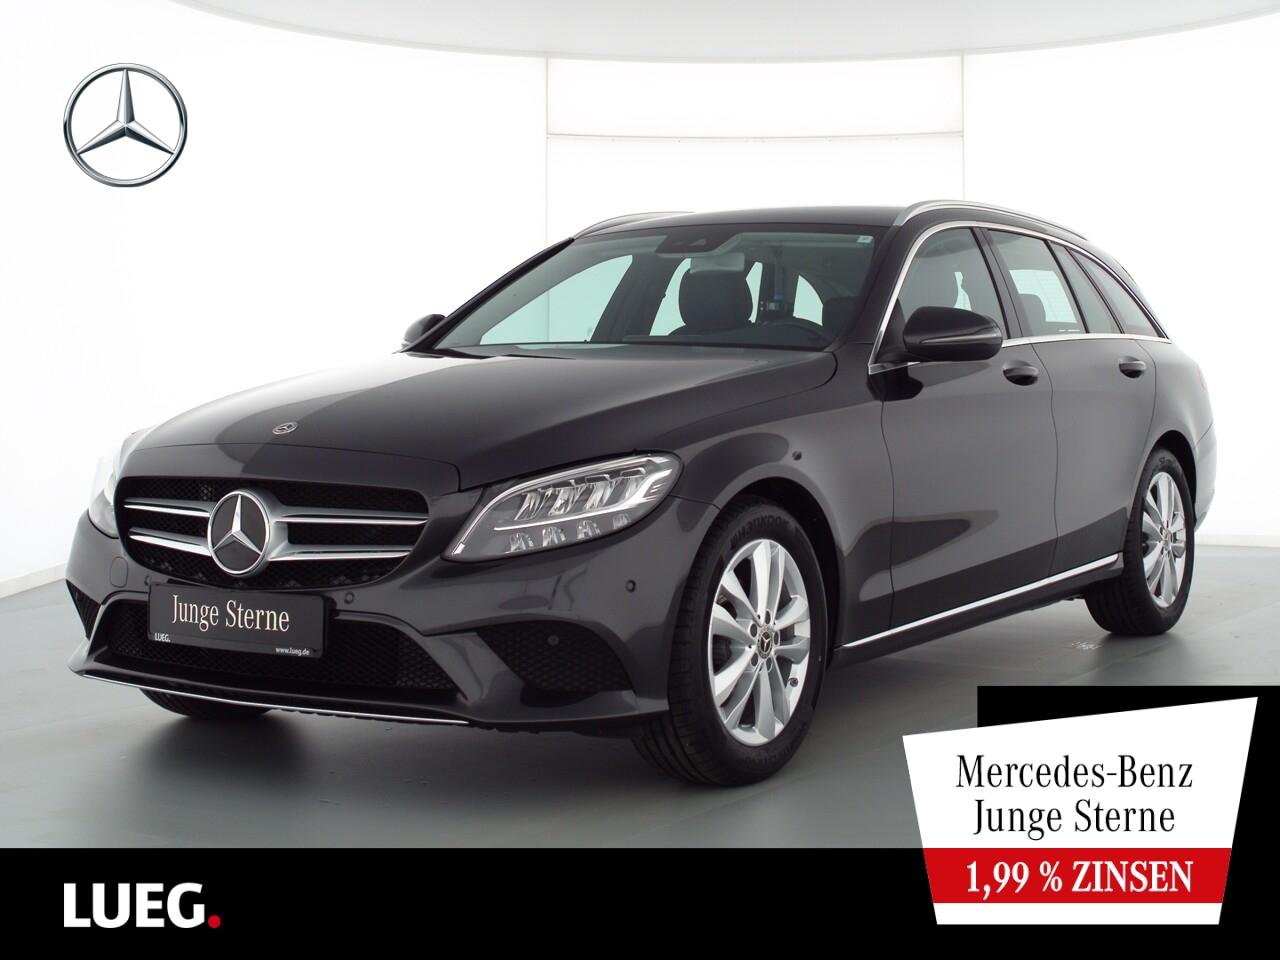 Mercedes-Benz C 180 T Avantgarde+Navi+LED-HP+Sthzg+CarP+Kamera, Jahr 2020, Benzin